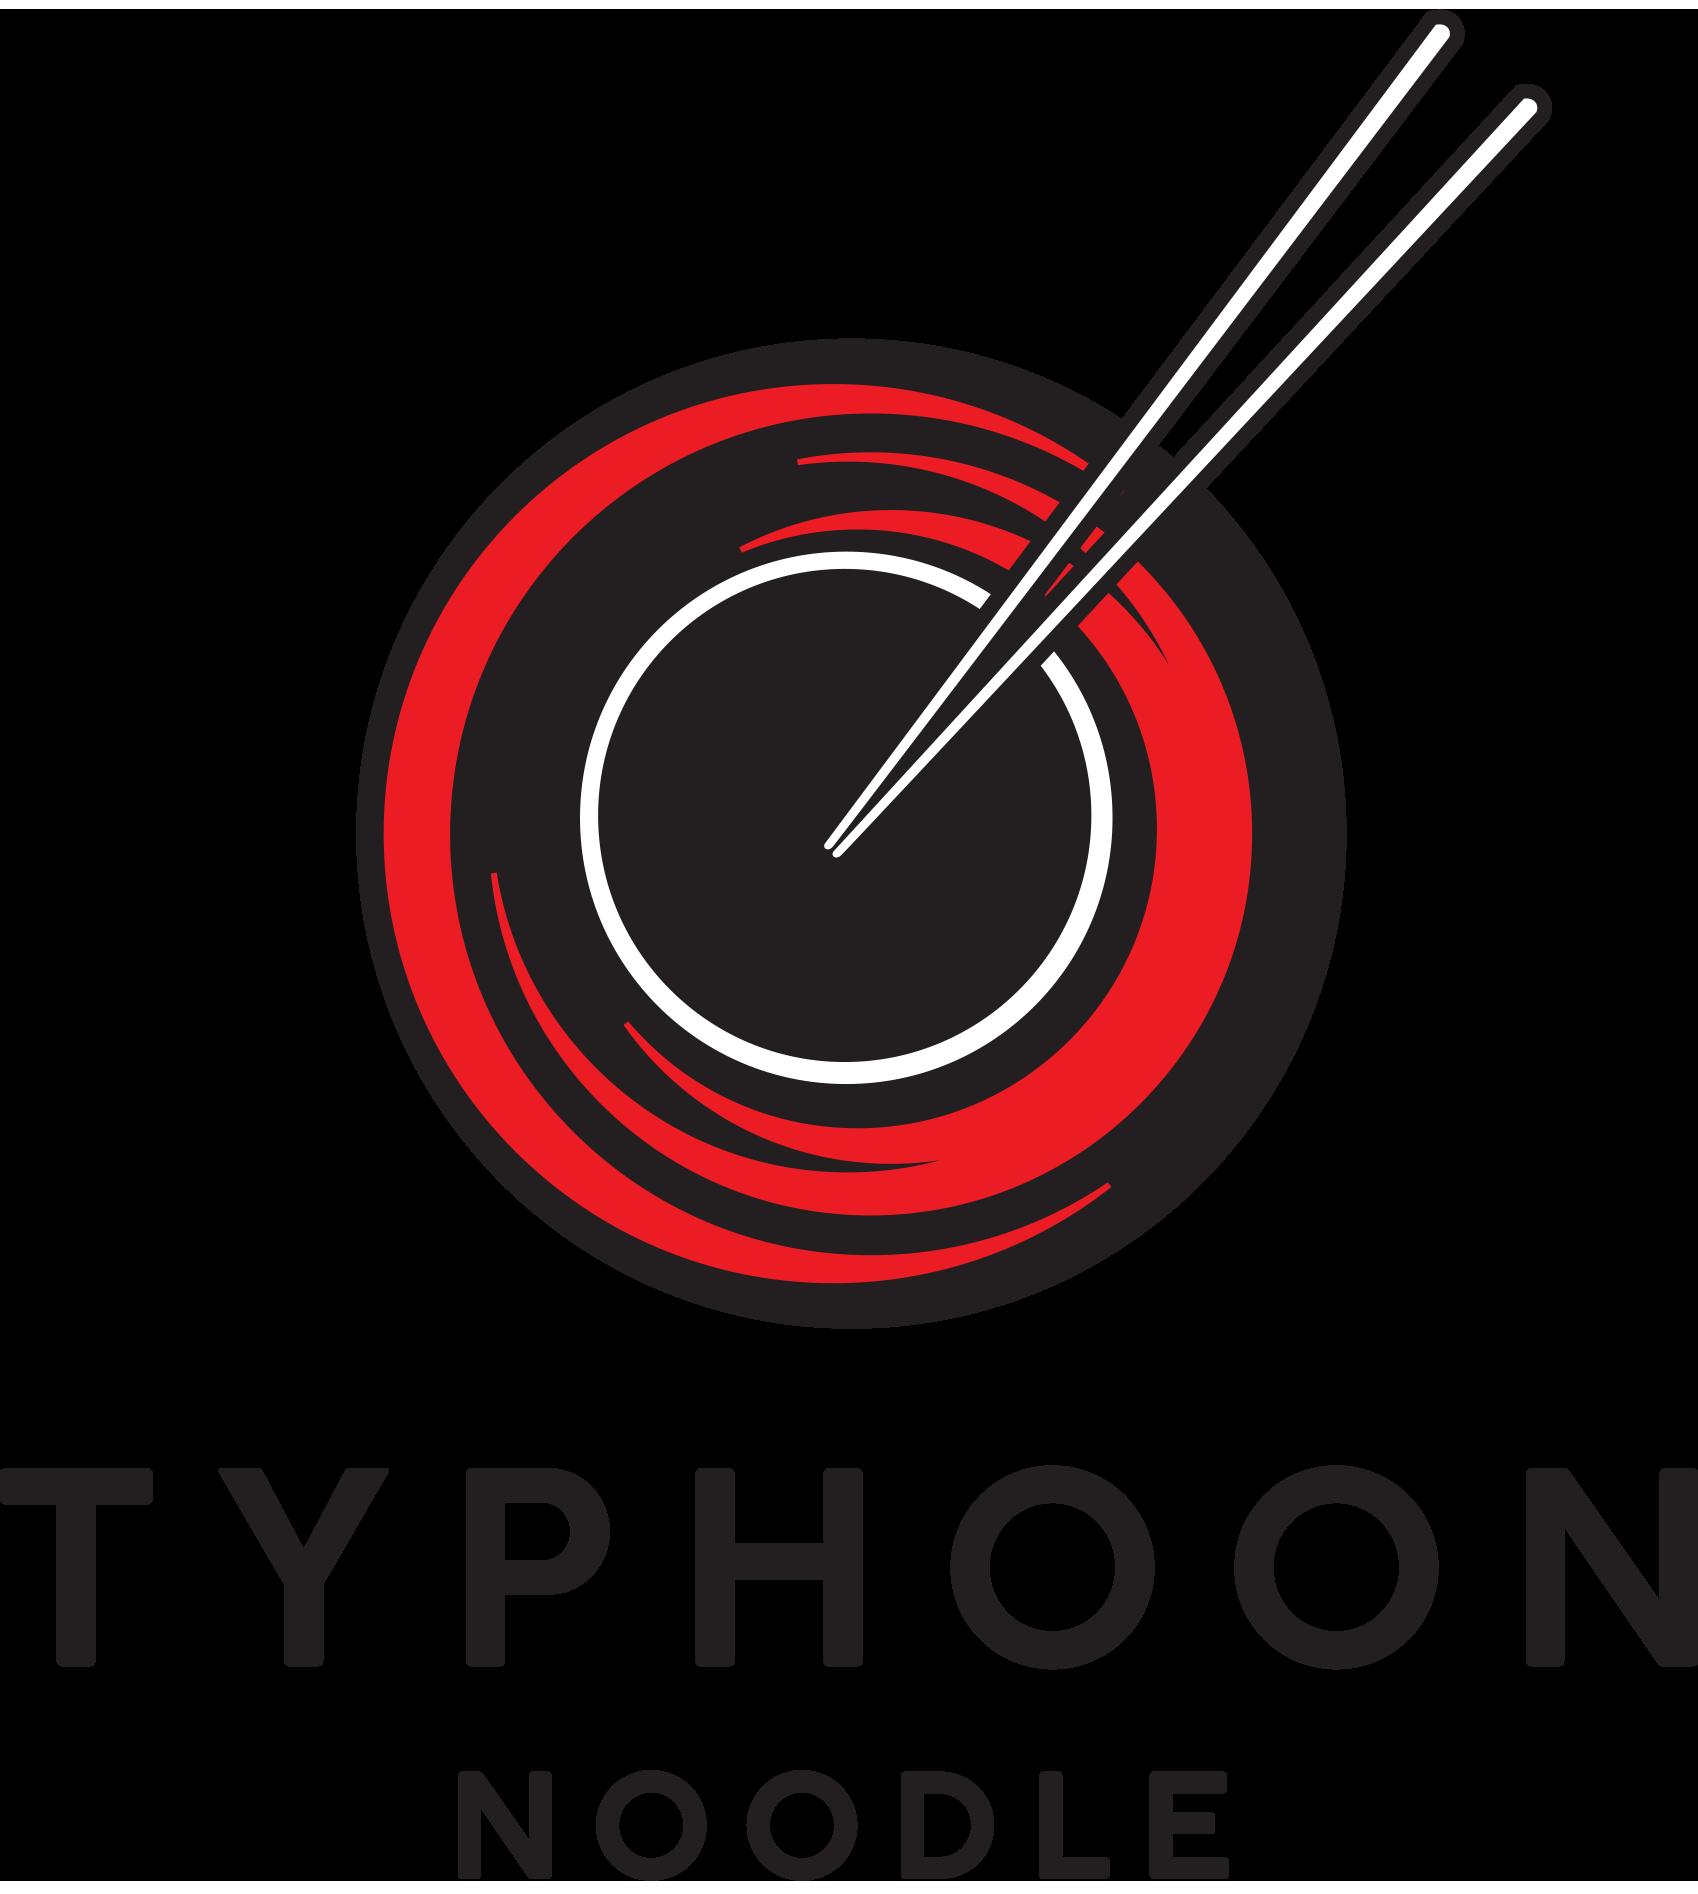 Typhoon Noodle Home